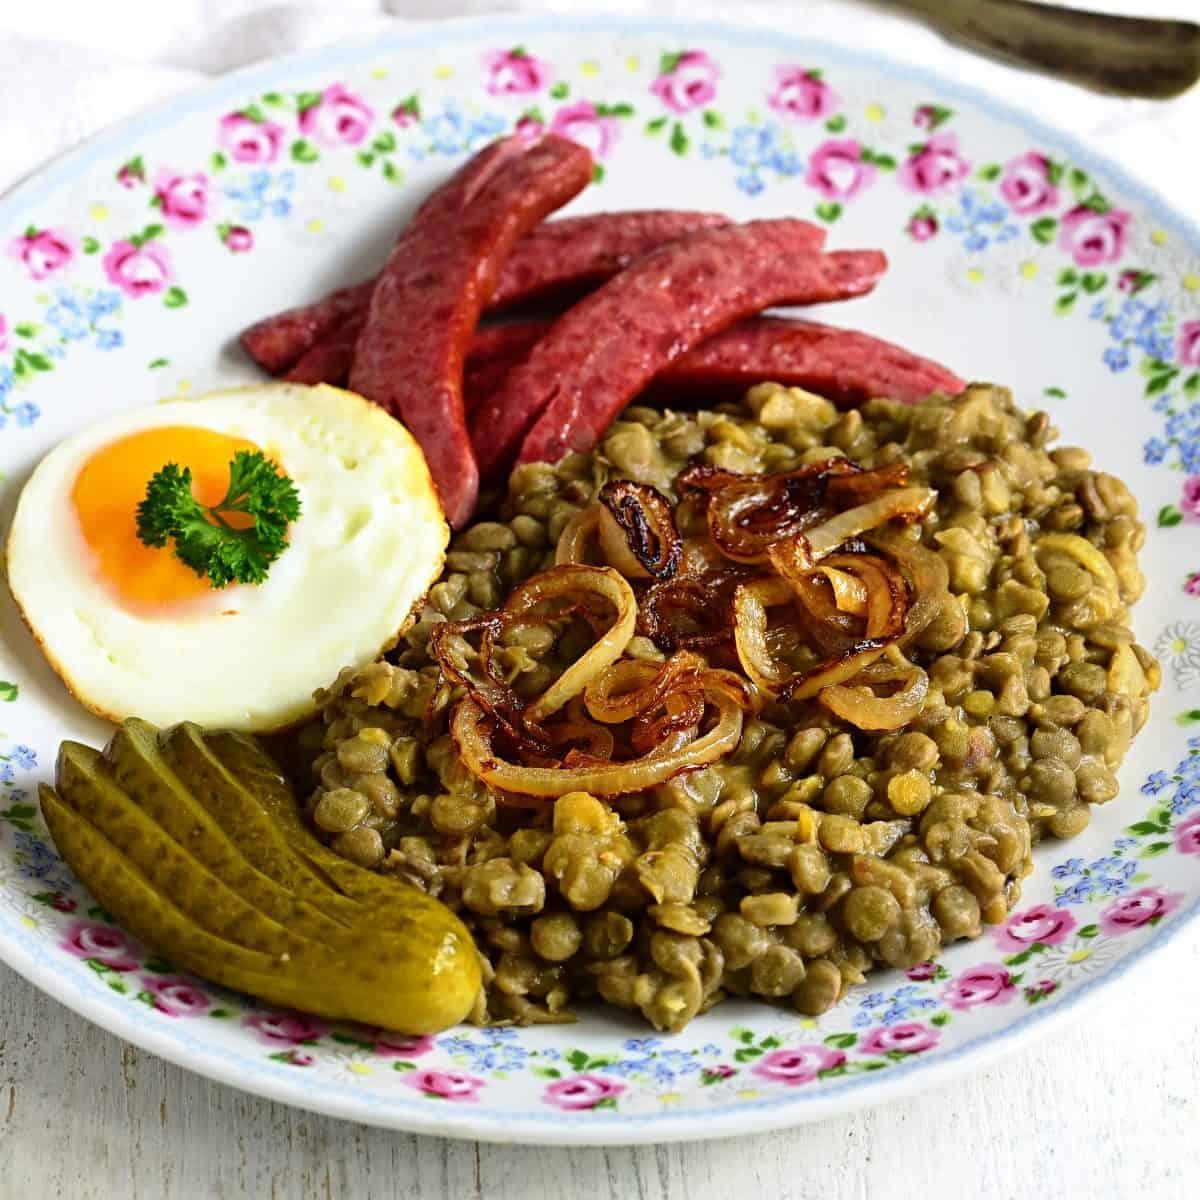 Czech dish čočka na kyselo served with fried egg, sausage, pickles.